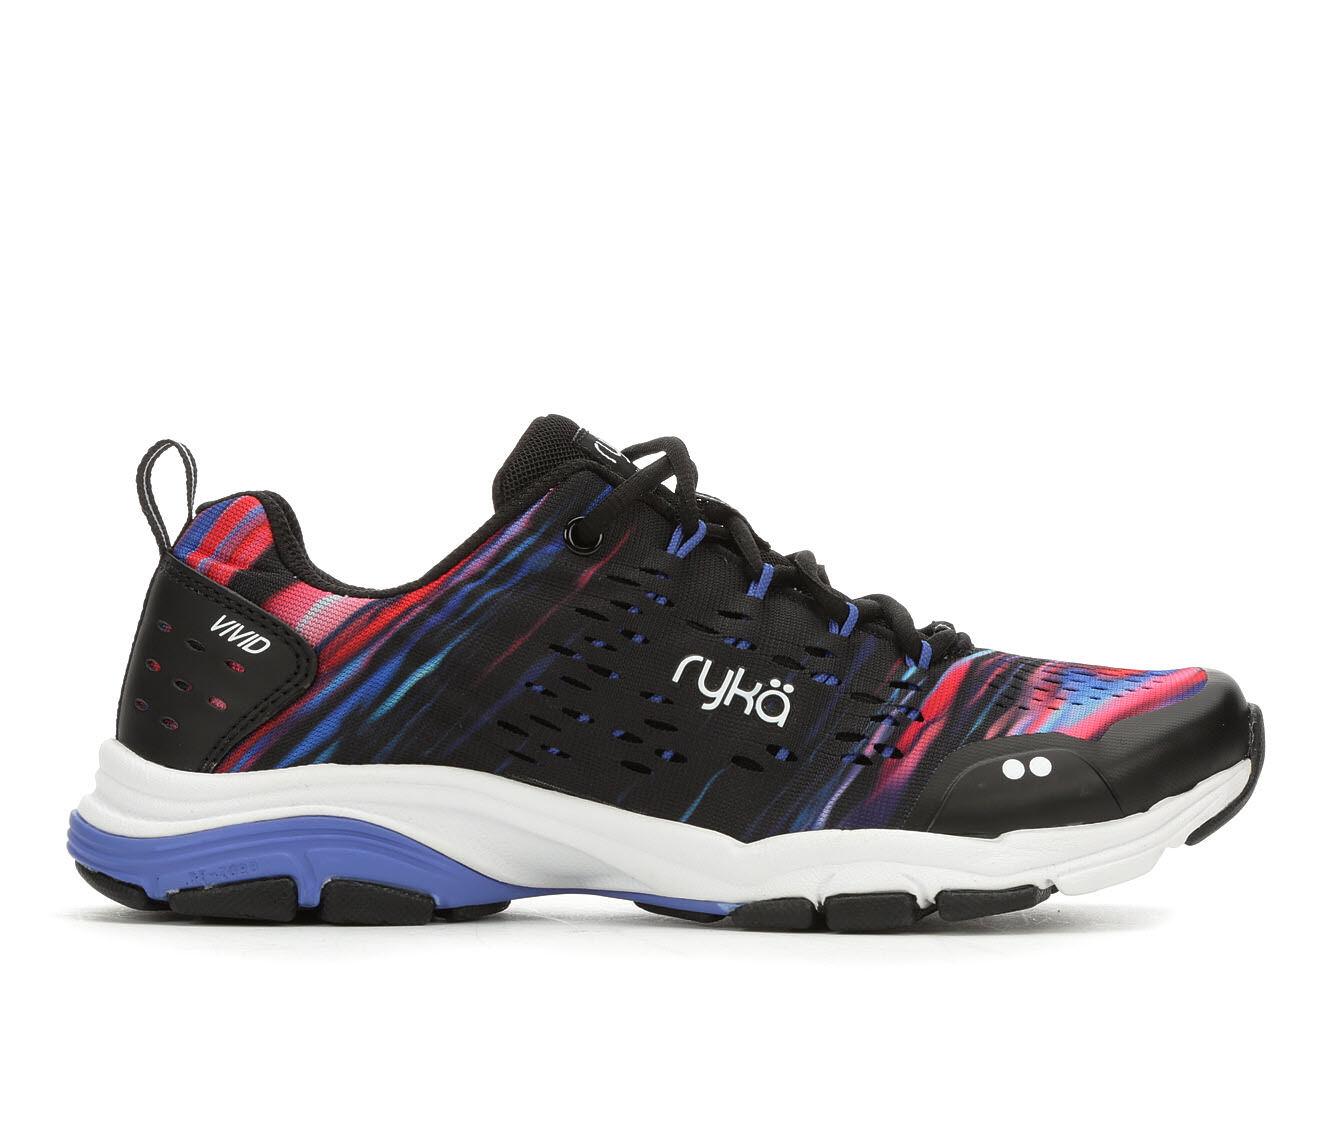 Women's Ryka Vivid RZX Training Shoes Black Multi